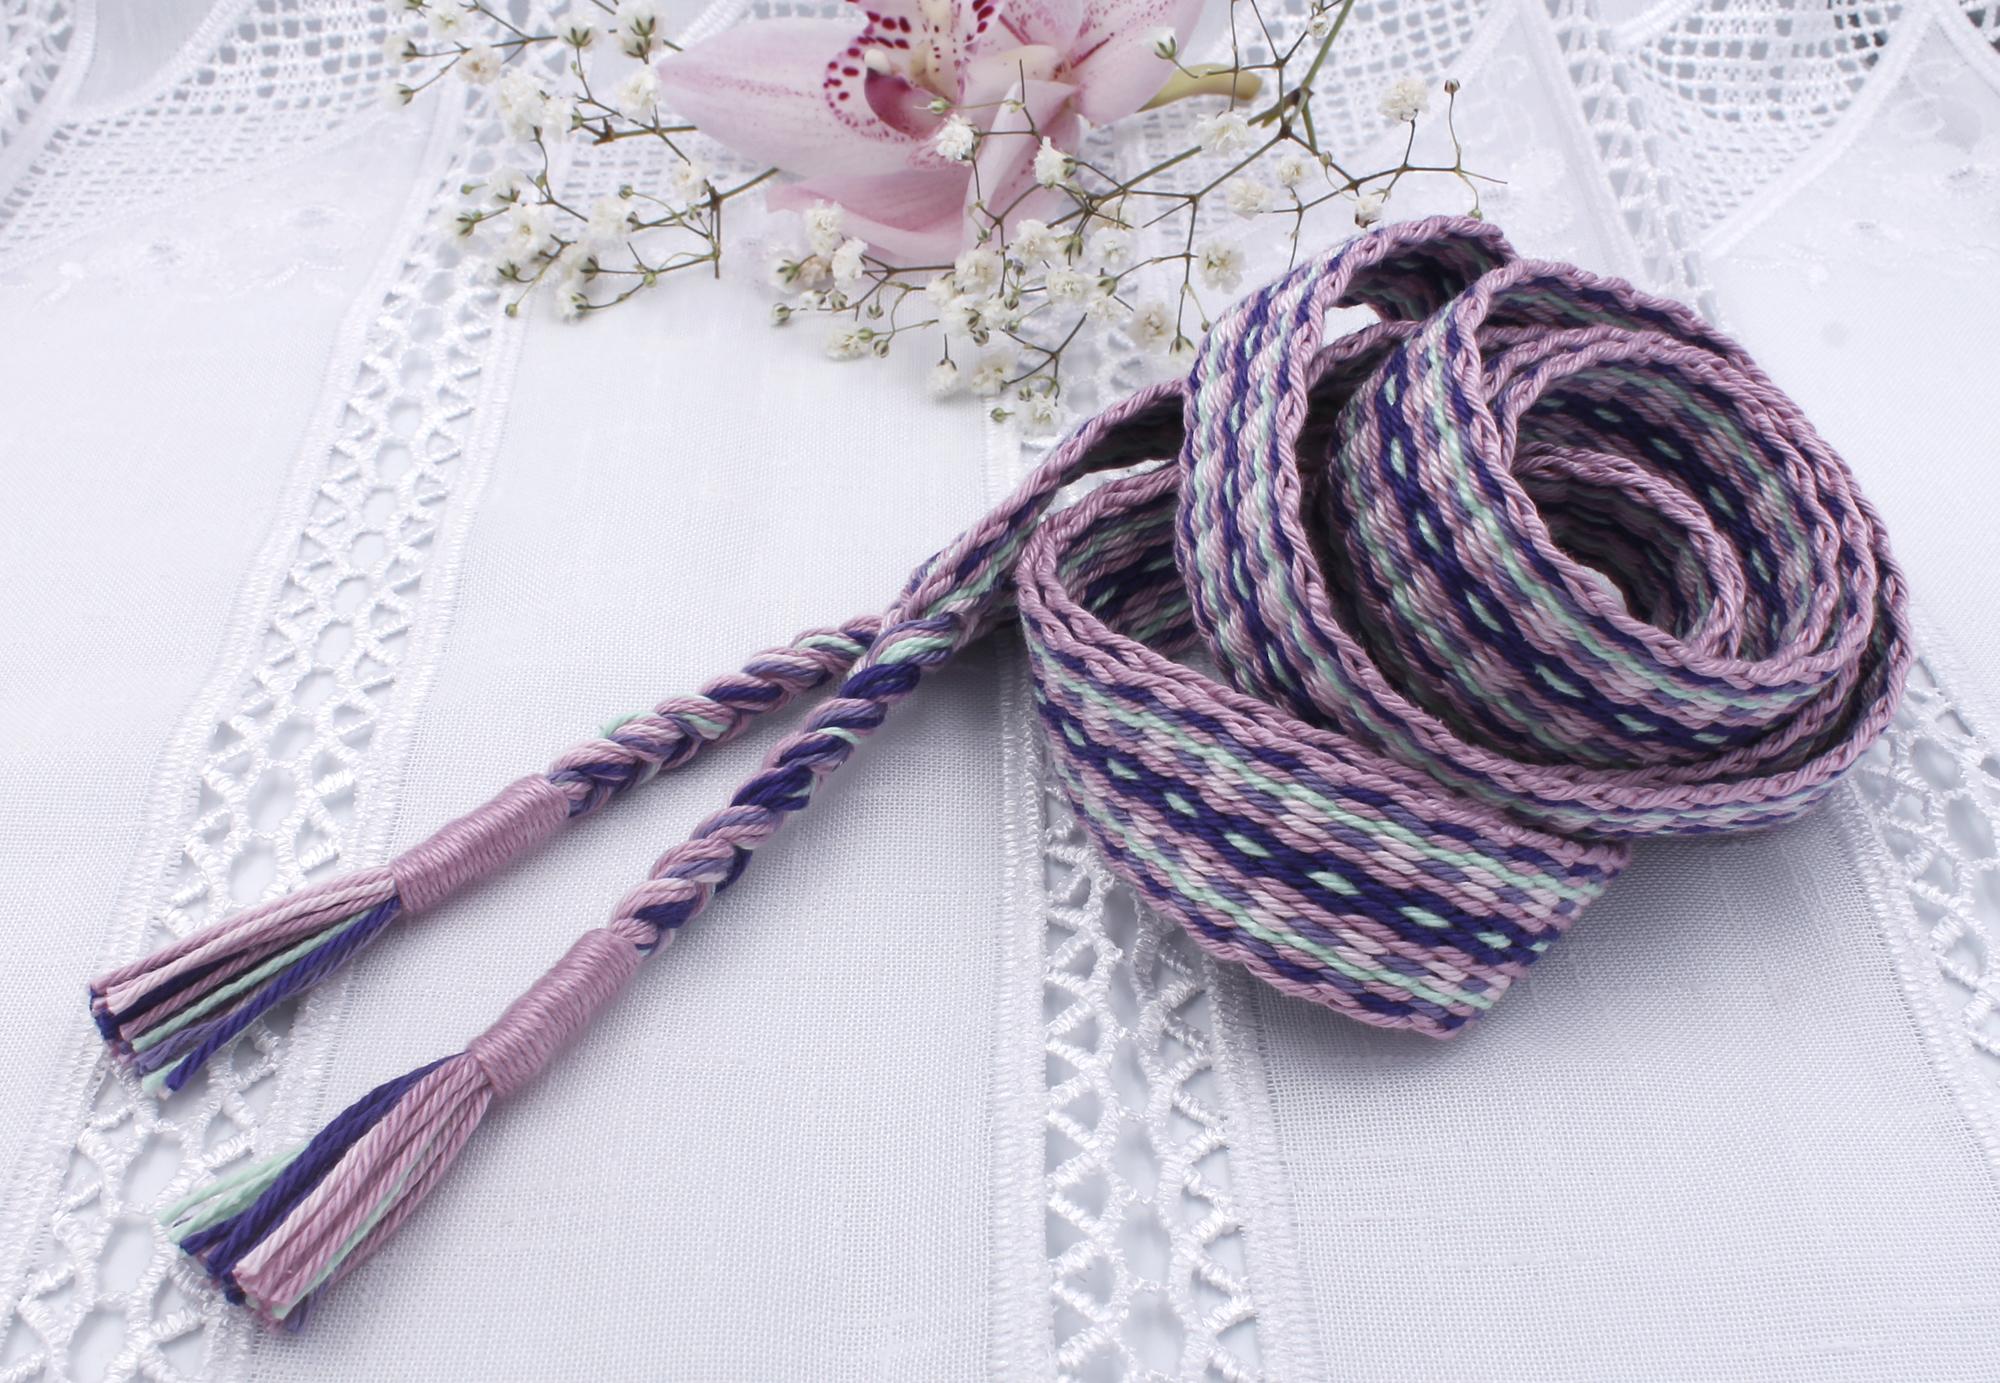 Cherry Blossom Handfasting Cord (4)